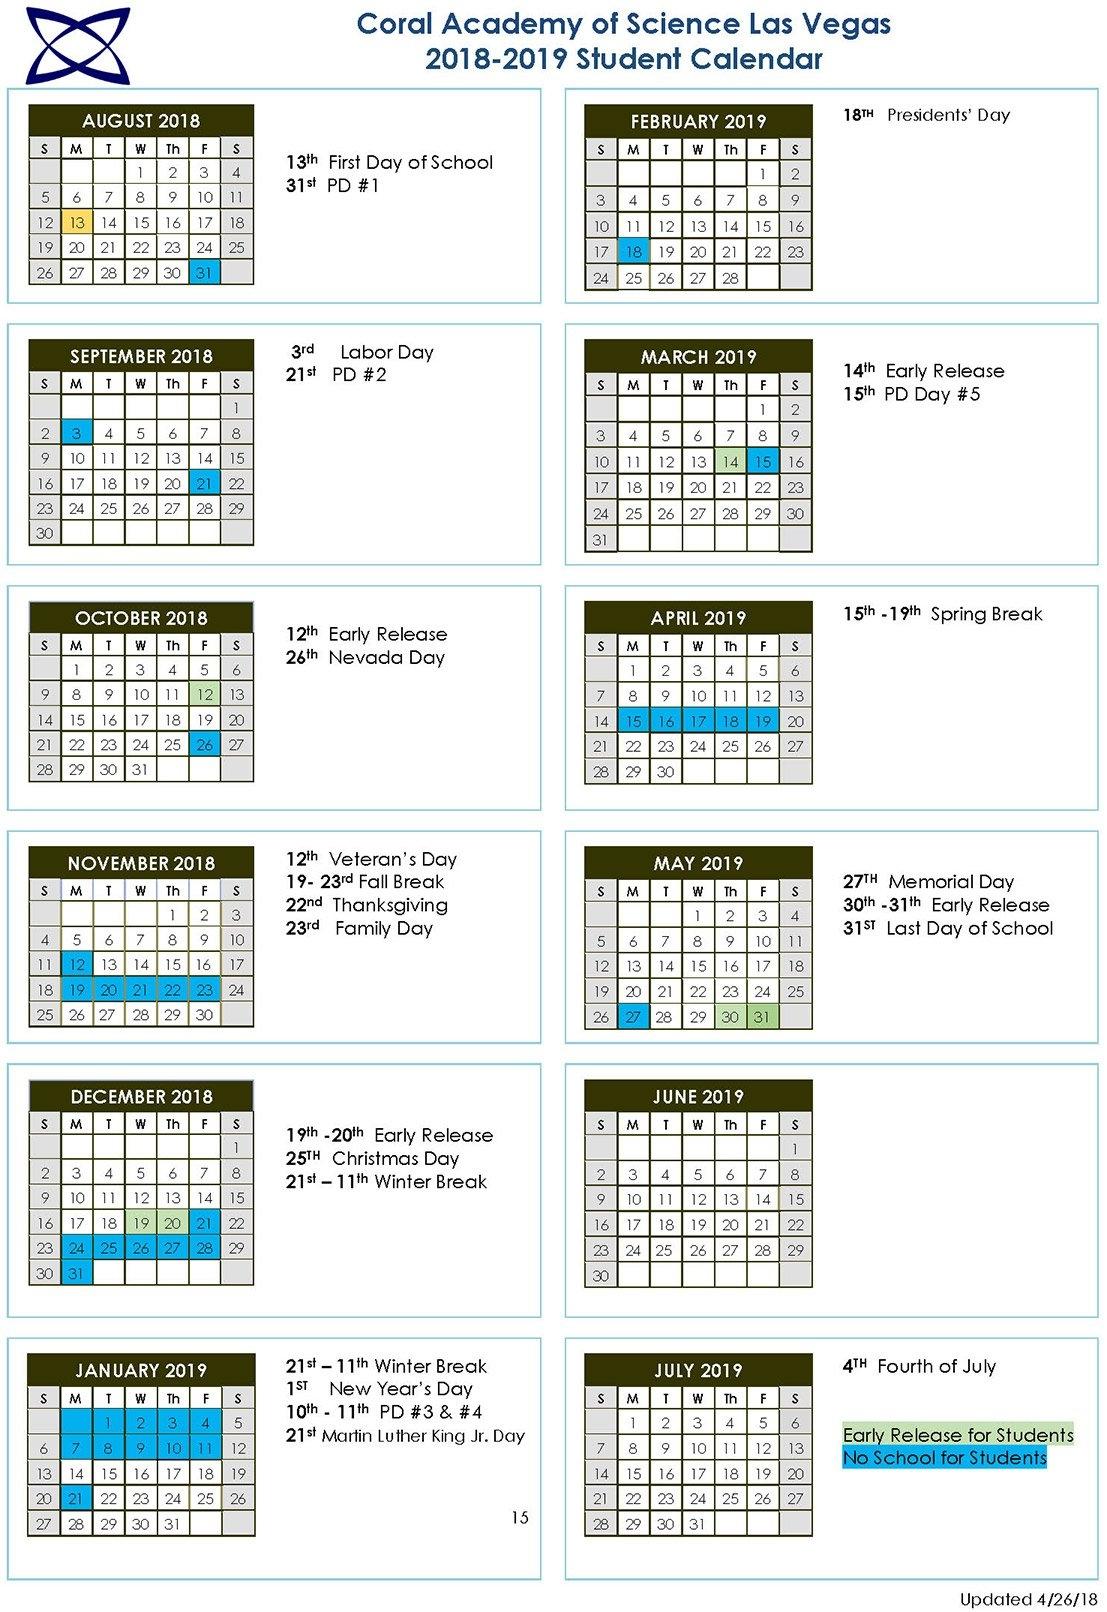 School Calendar 2018-2019 | Coral Academy Of Science Las Vegas Calendar 2019 Spring Break